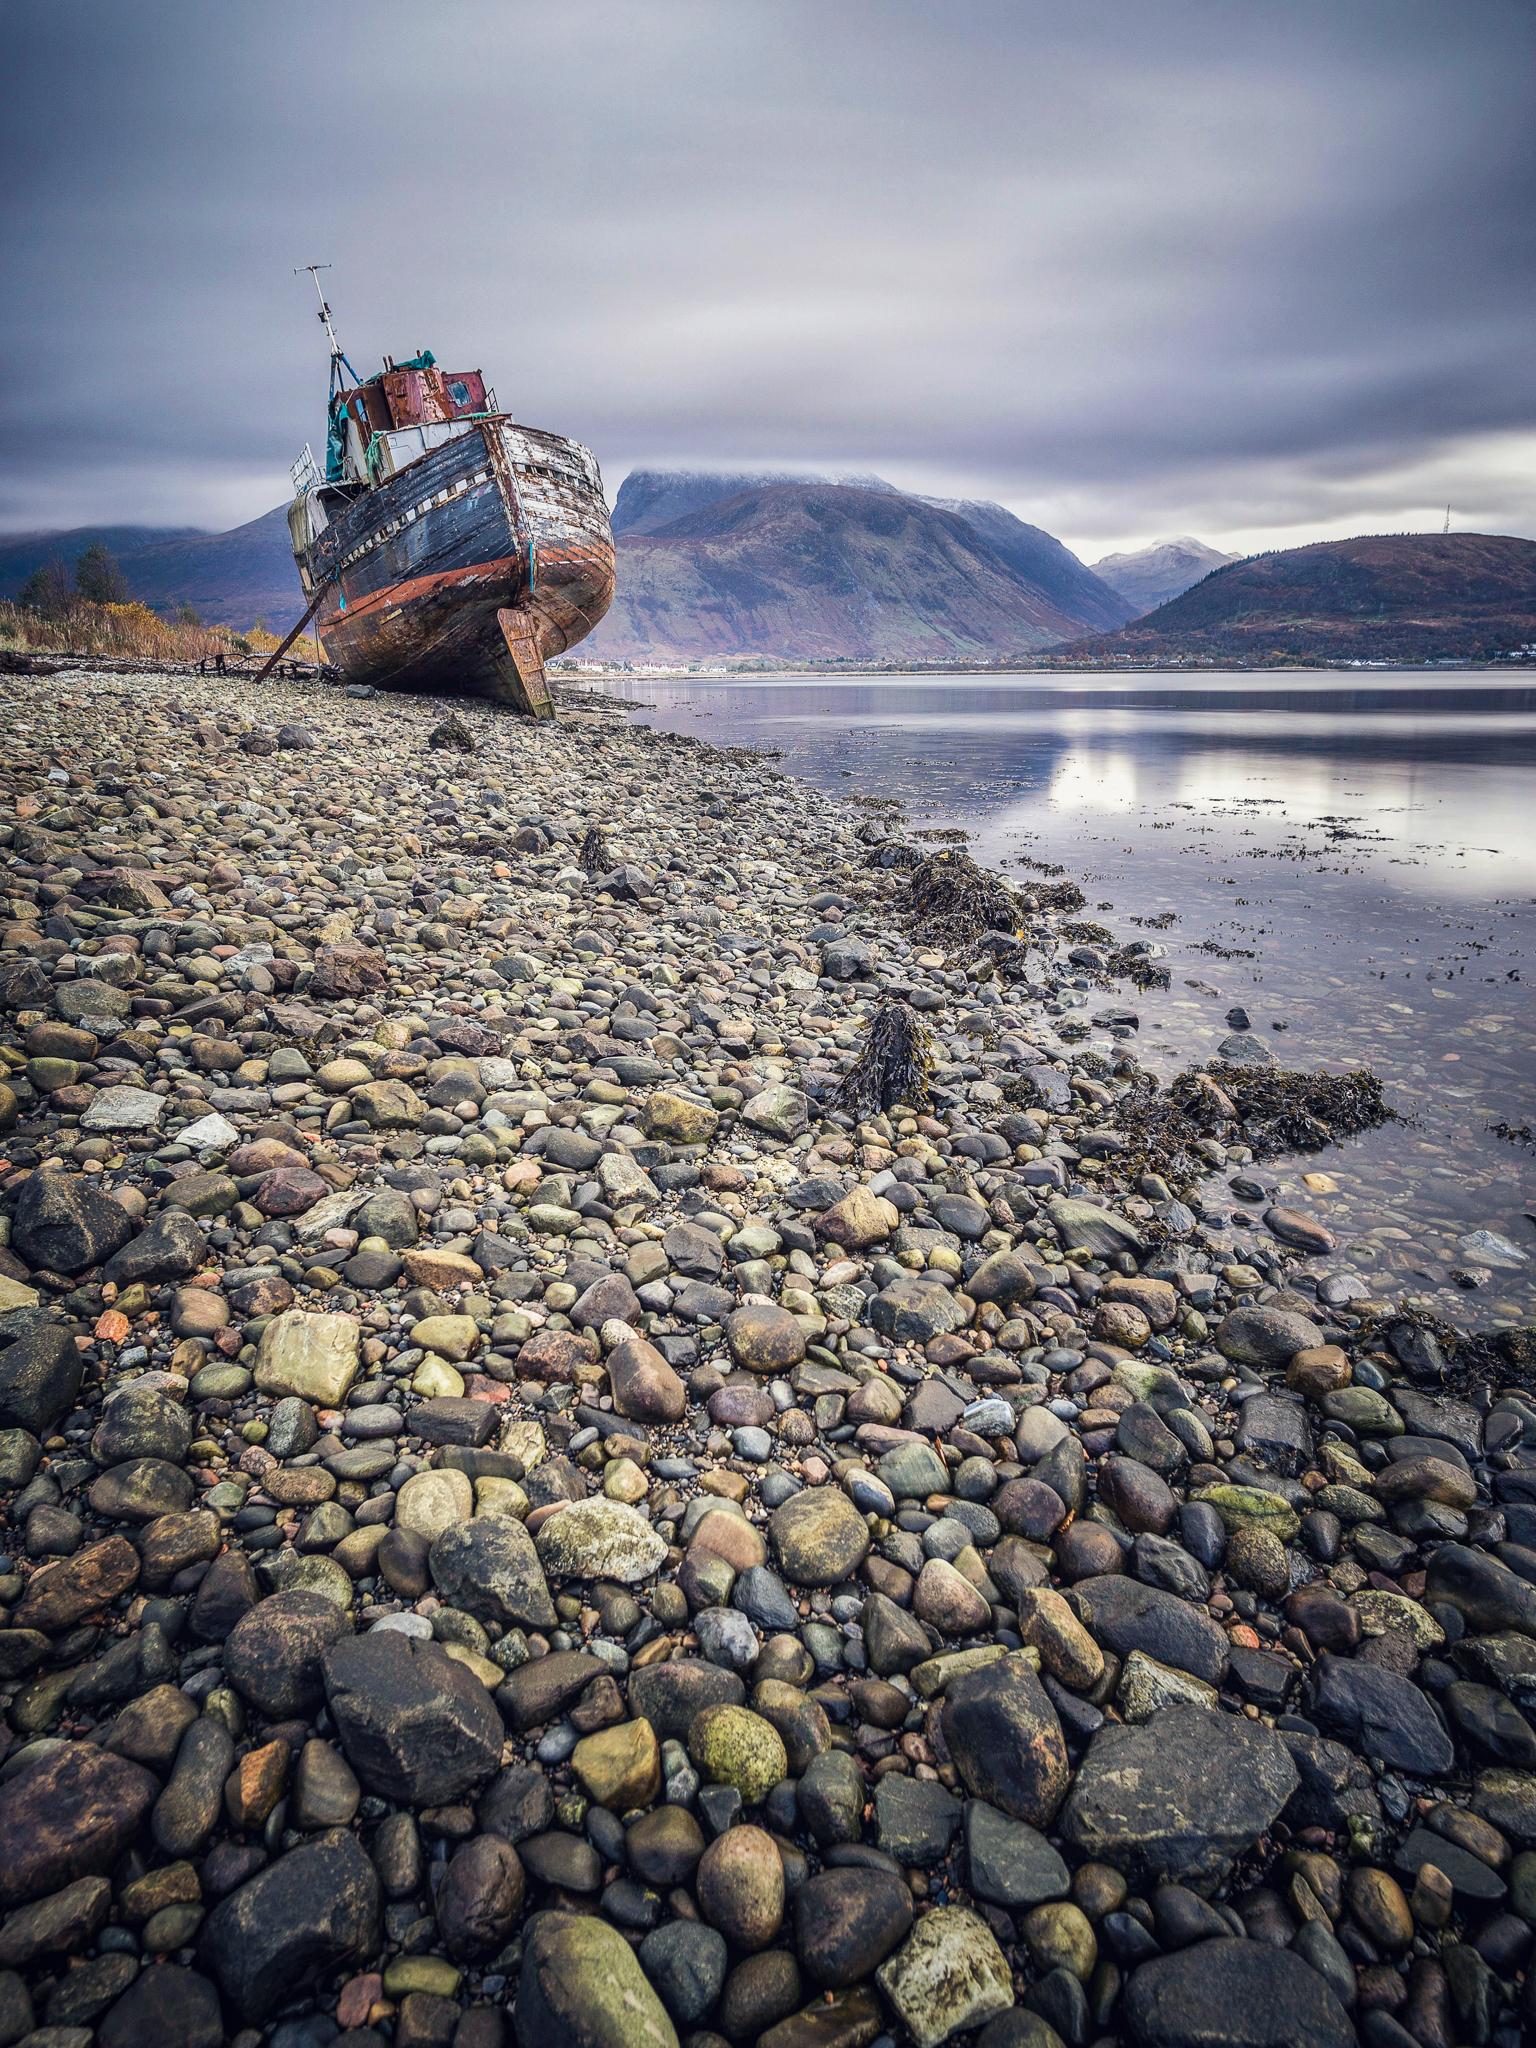 Shipwreck - Scotland 2016